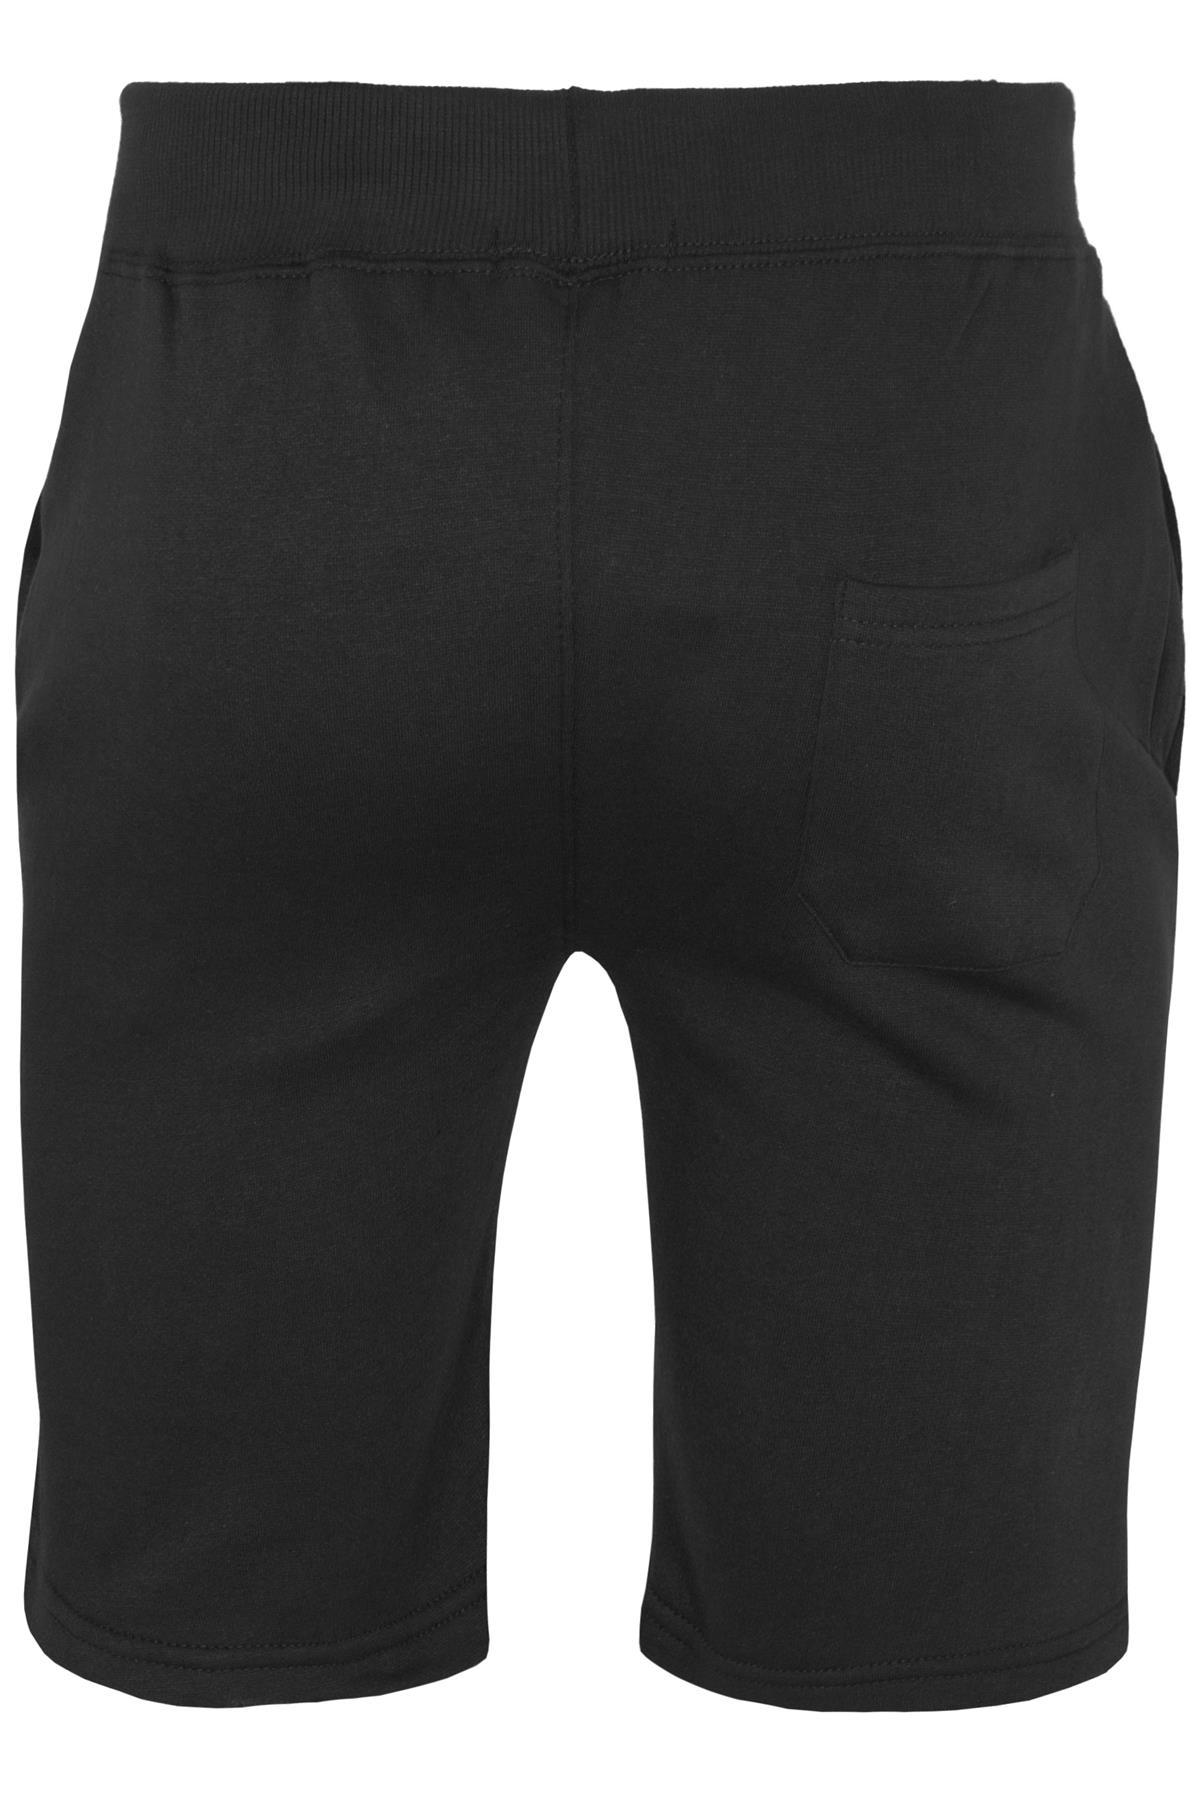 Mens-Contrast-Panel-Running-Summer-Side-Slit-Knee-Length-Fleece-Bottoms-Shorts thumbnail 60